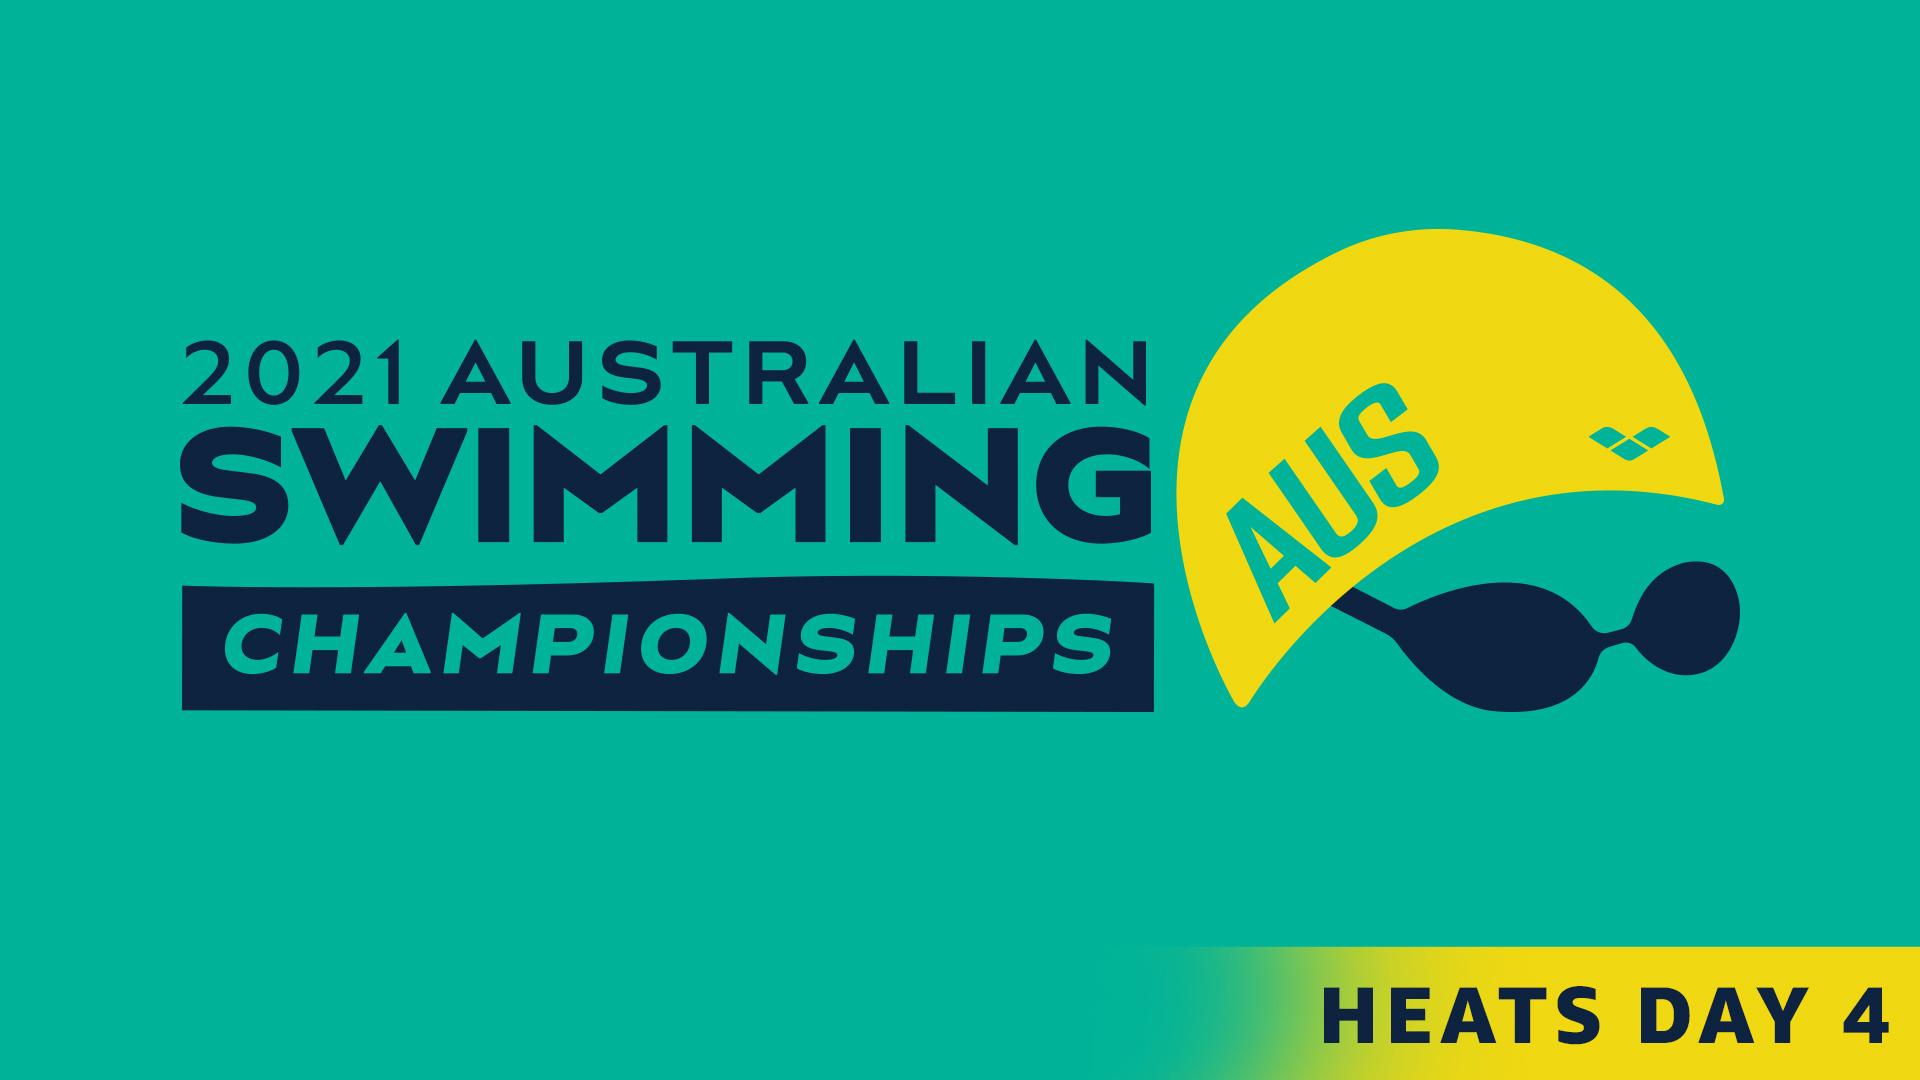 Australian Swimming Championships: Day 4 Heats